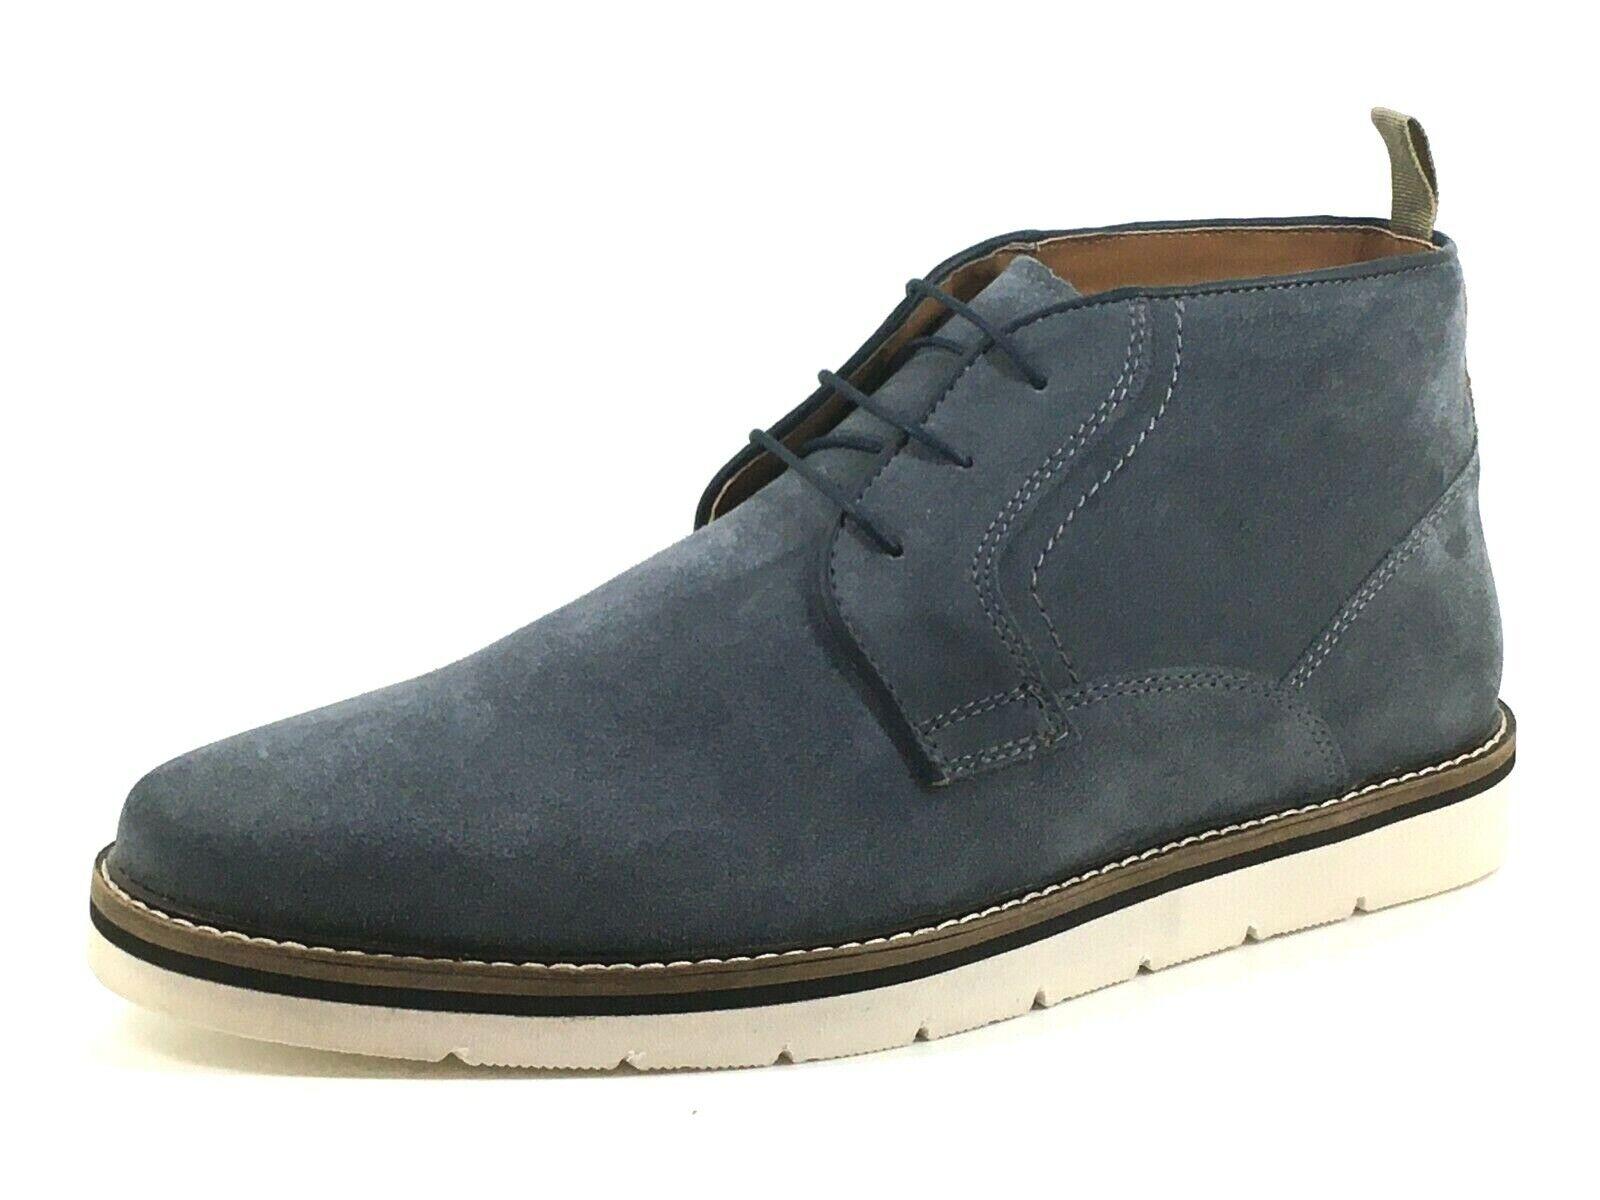 Find. Mens Gents UK 10 EU 44 Light Blue Suede Lace Up Desert Chukka Ankle Boots